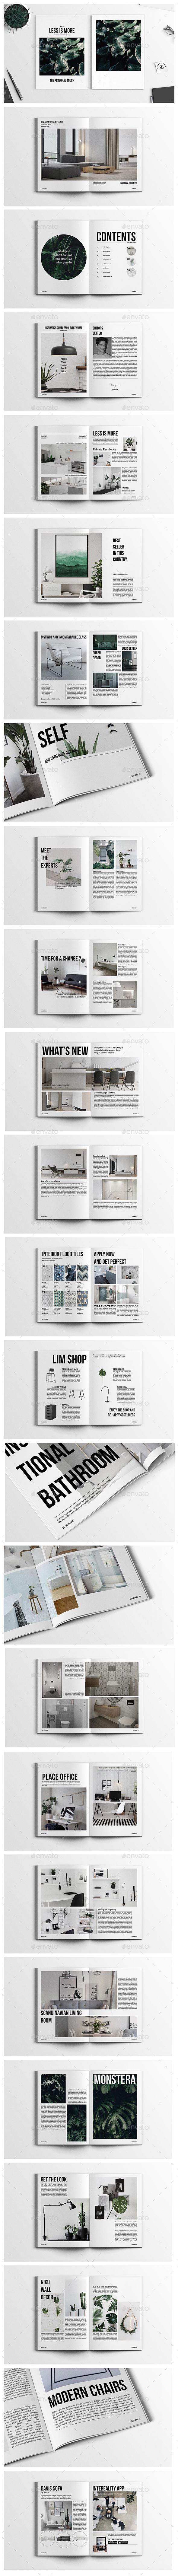 Home Design & Interior Magazine - Magazines Print Templates